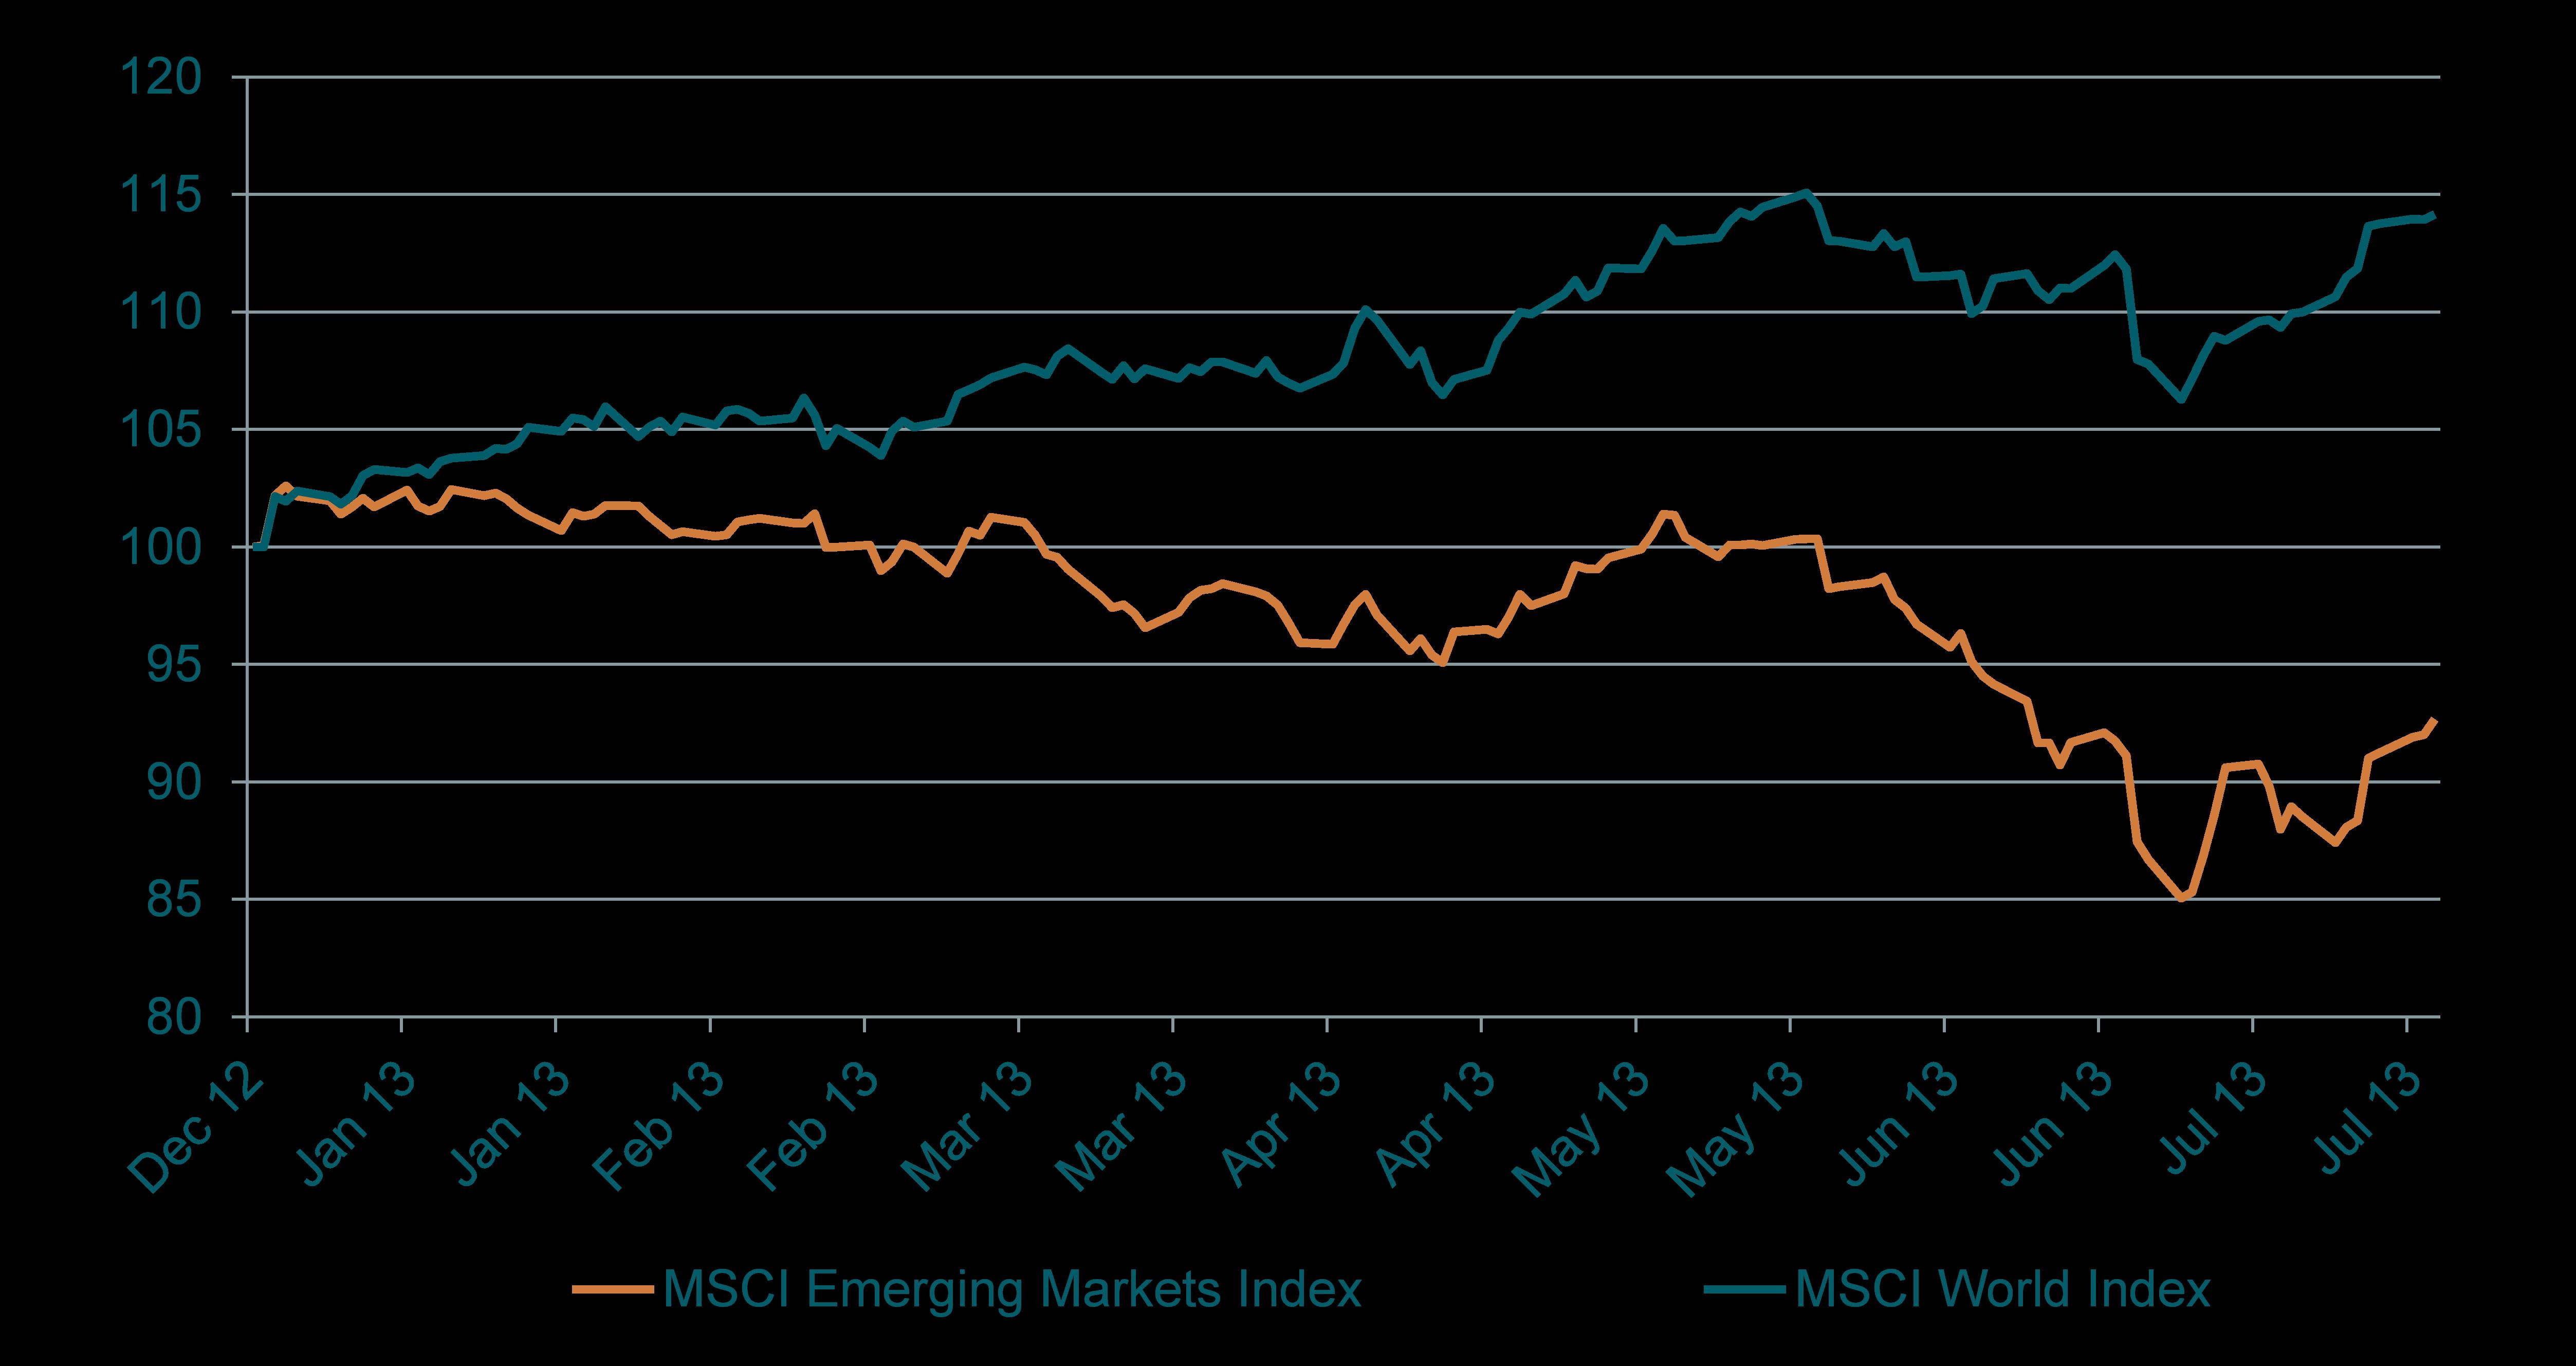 Performance Mercati Emergenti 2013